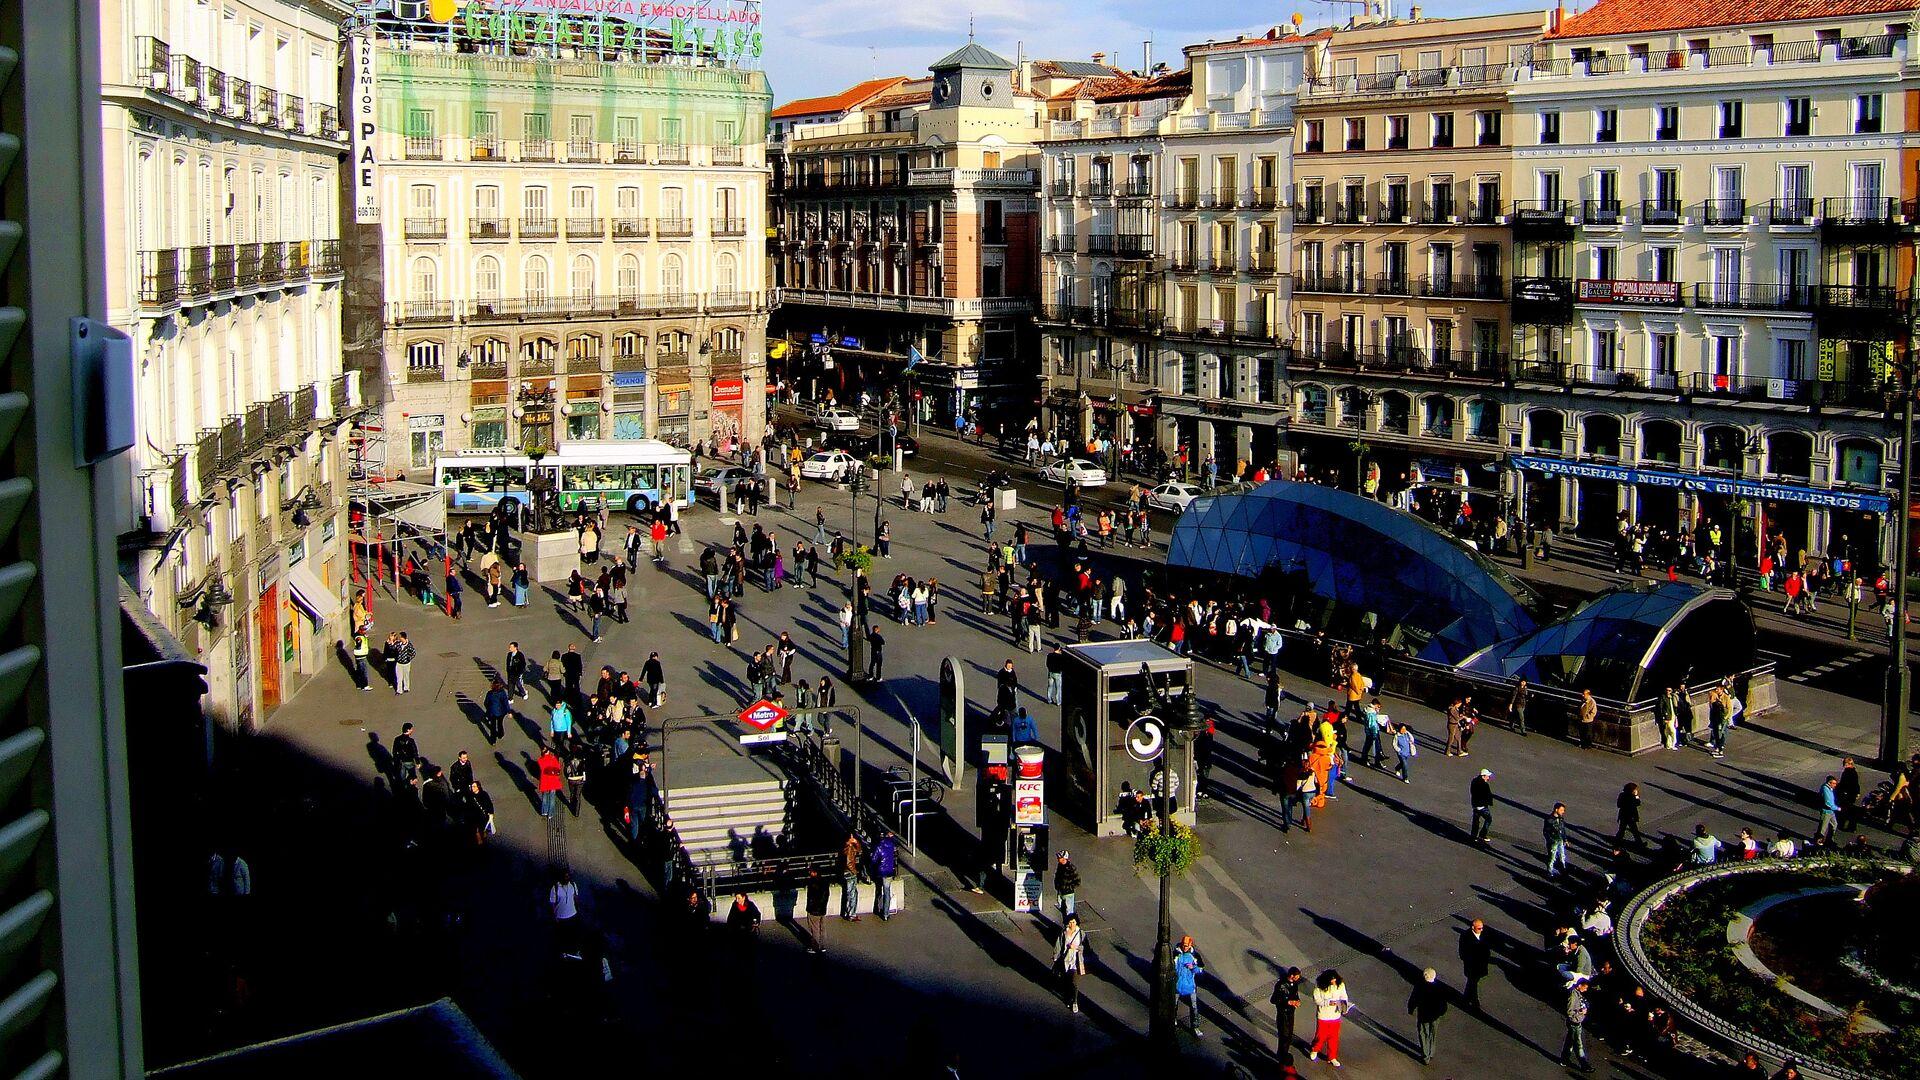 Puerta del Sol en Madrid (archivo) - Sputnik Mundo, 1920, 05.07.2021